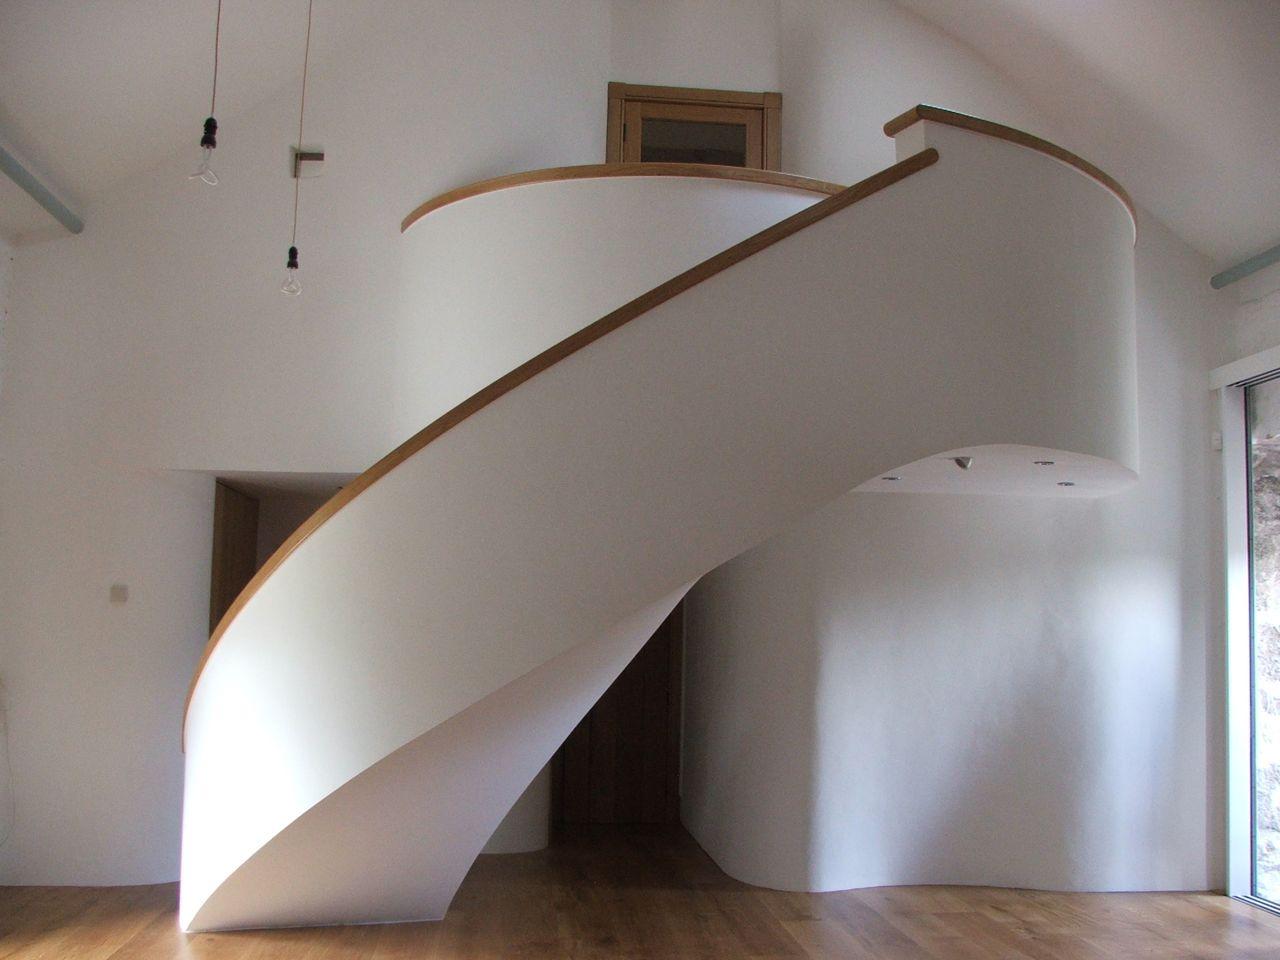 Hall Stair 02 Image0065 copy